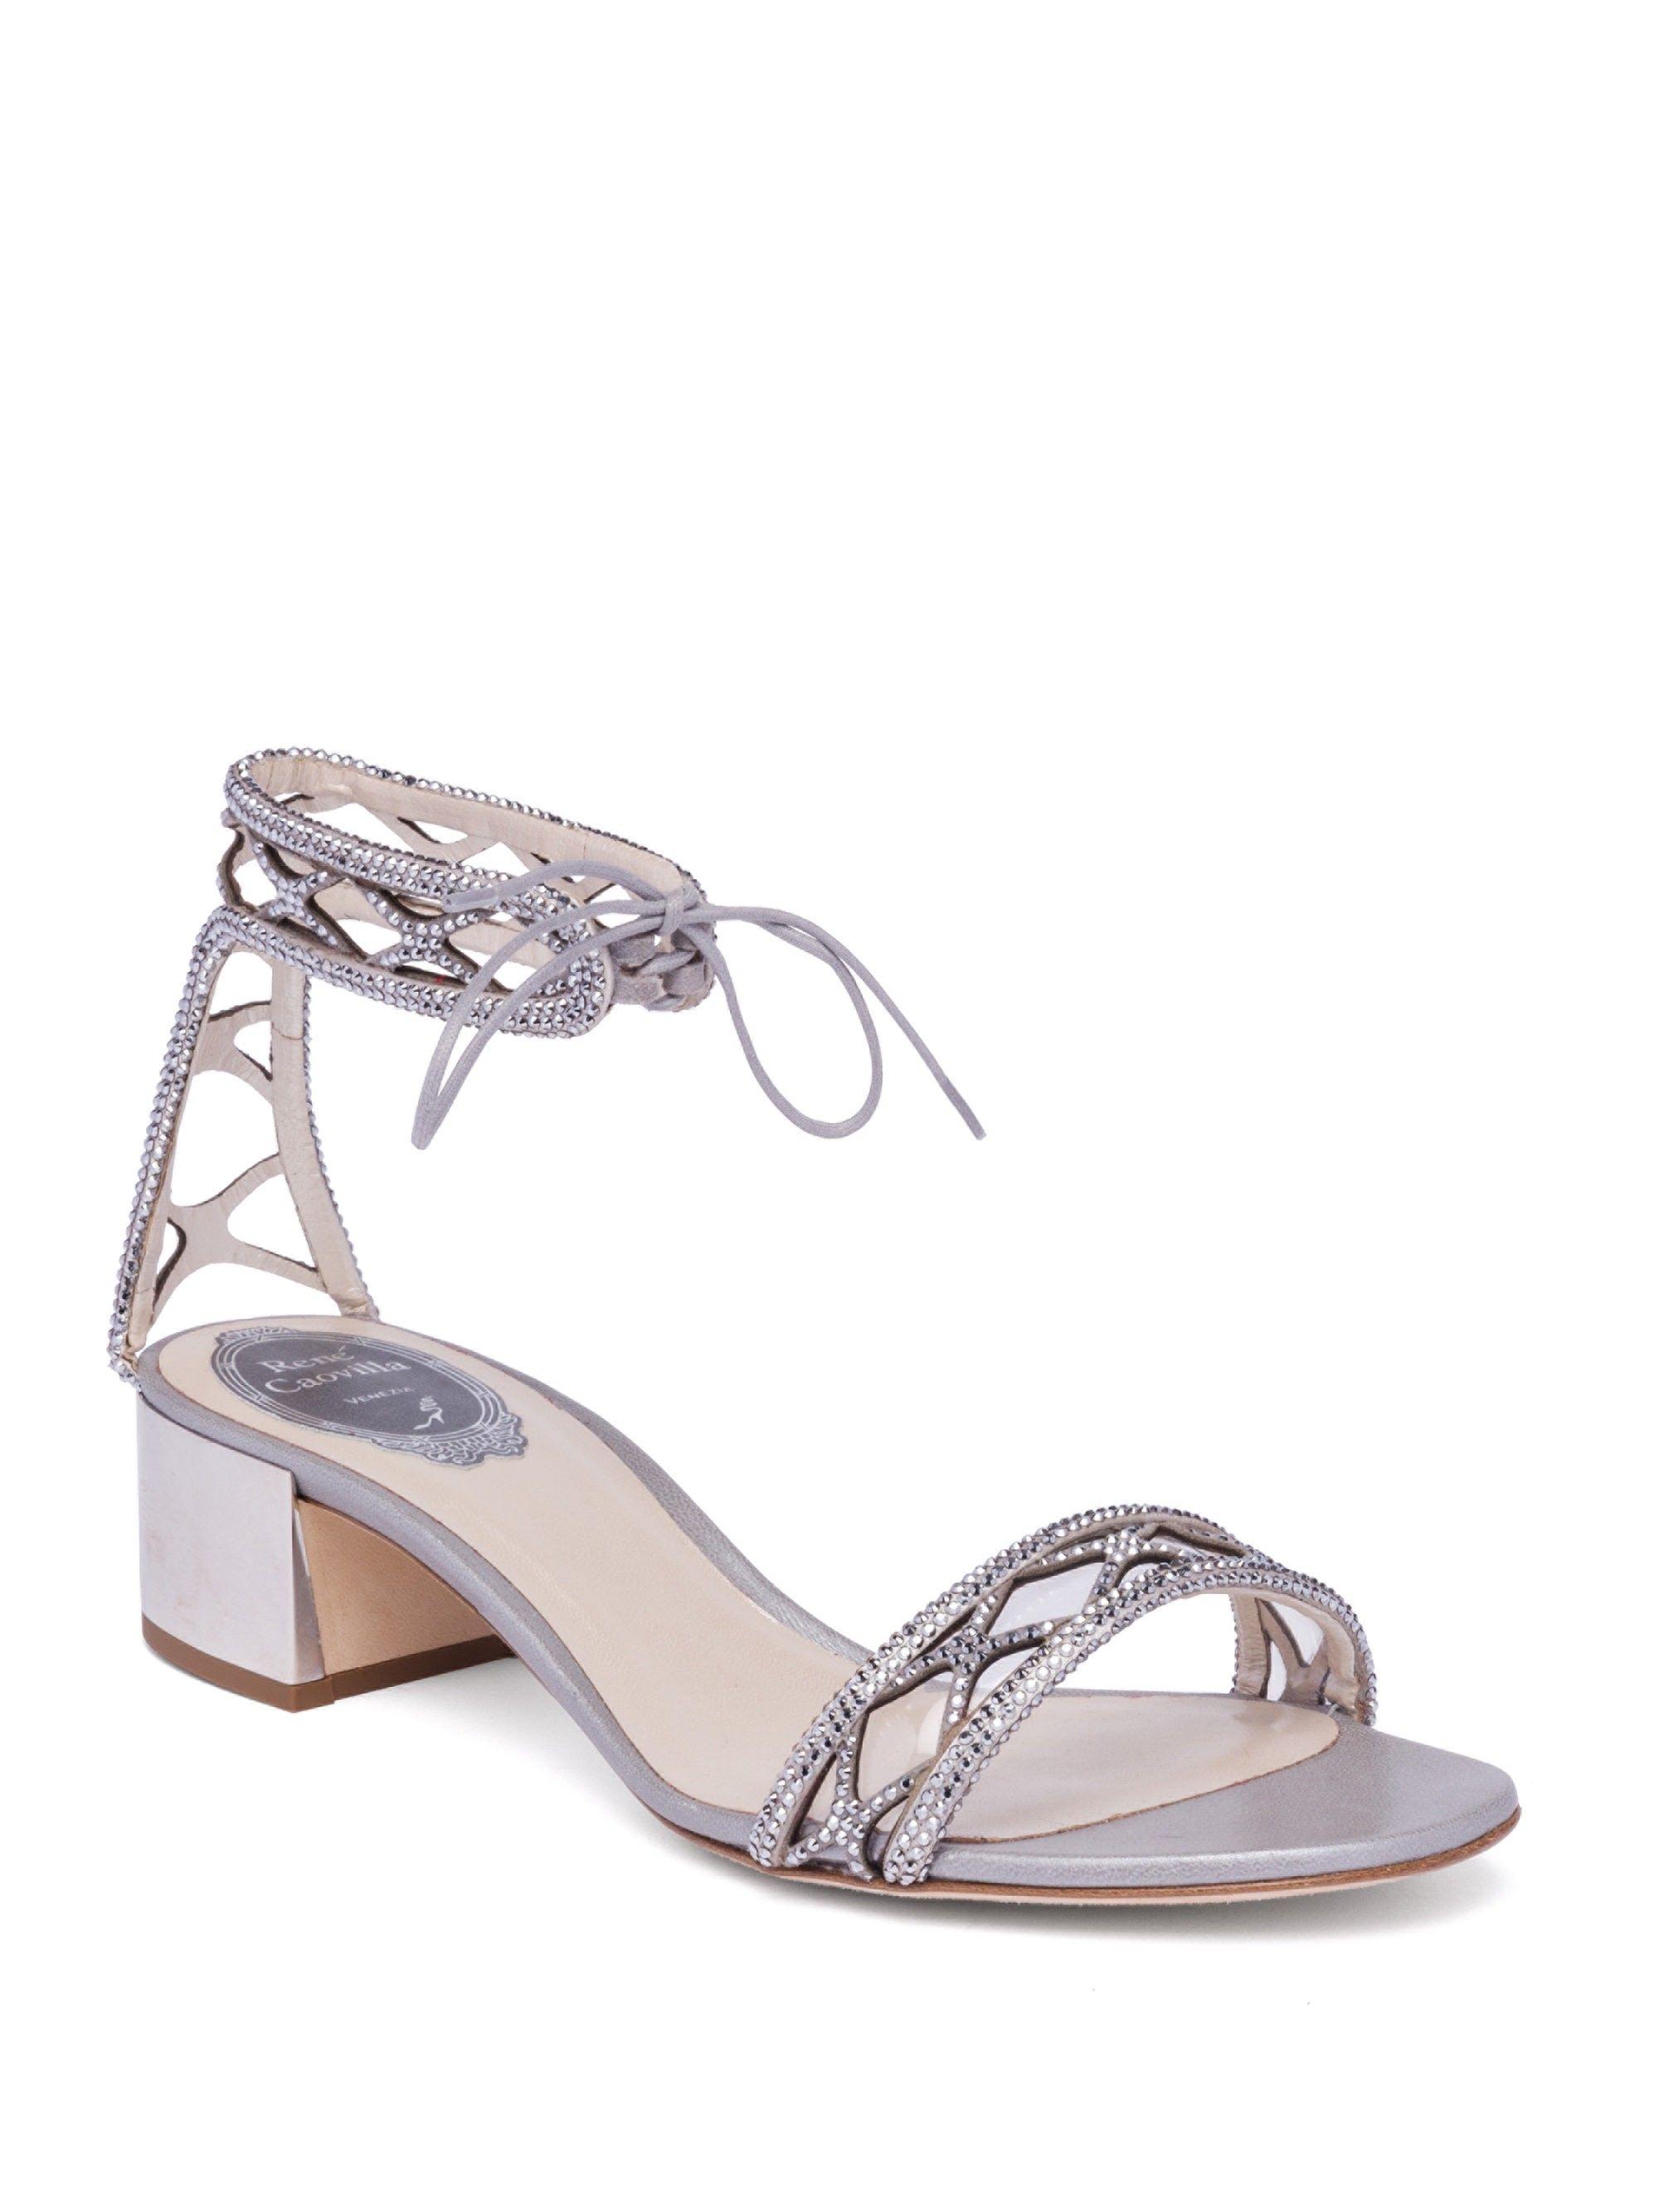 98336ca07a6 Rene Caovilla Crystal   Suede Ankle-Tie Block Heel Sandals - Silver 37.5  (7.5)